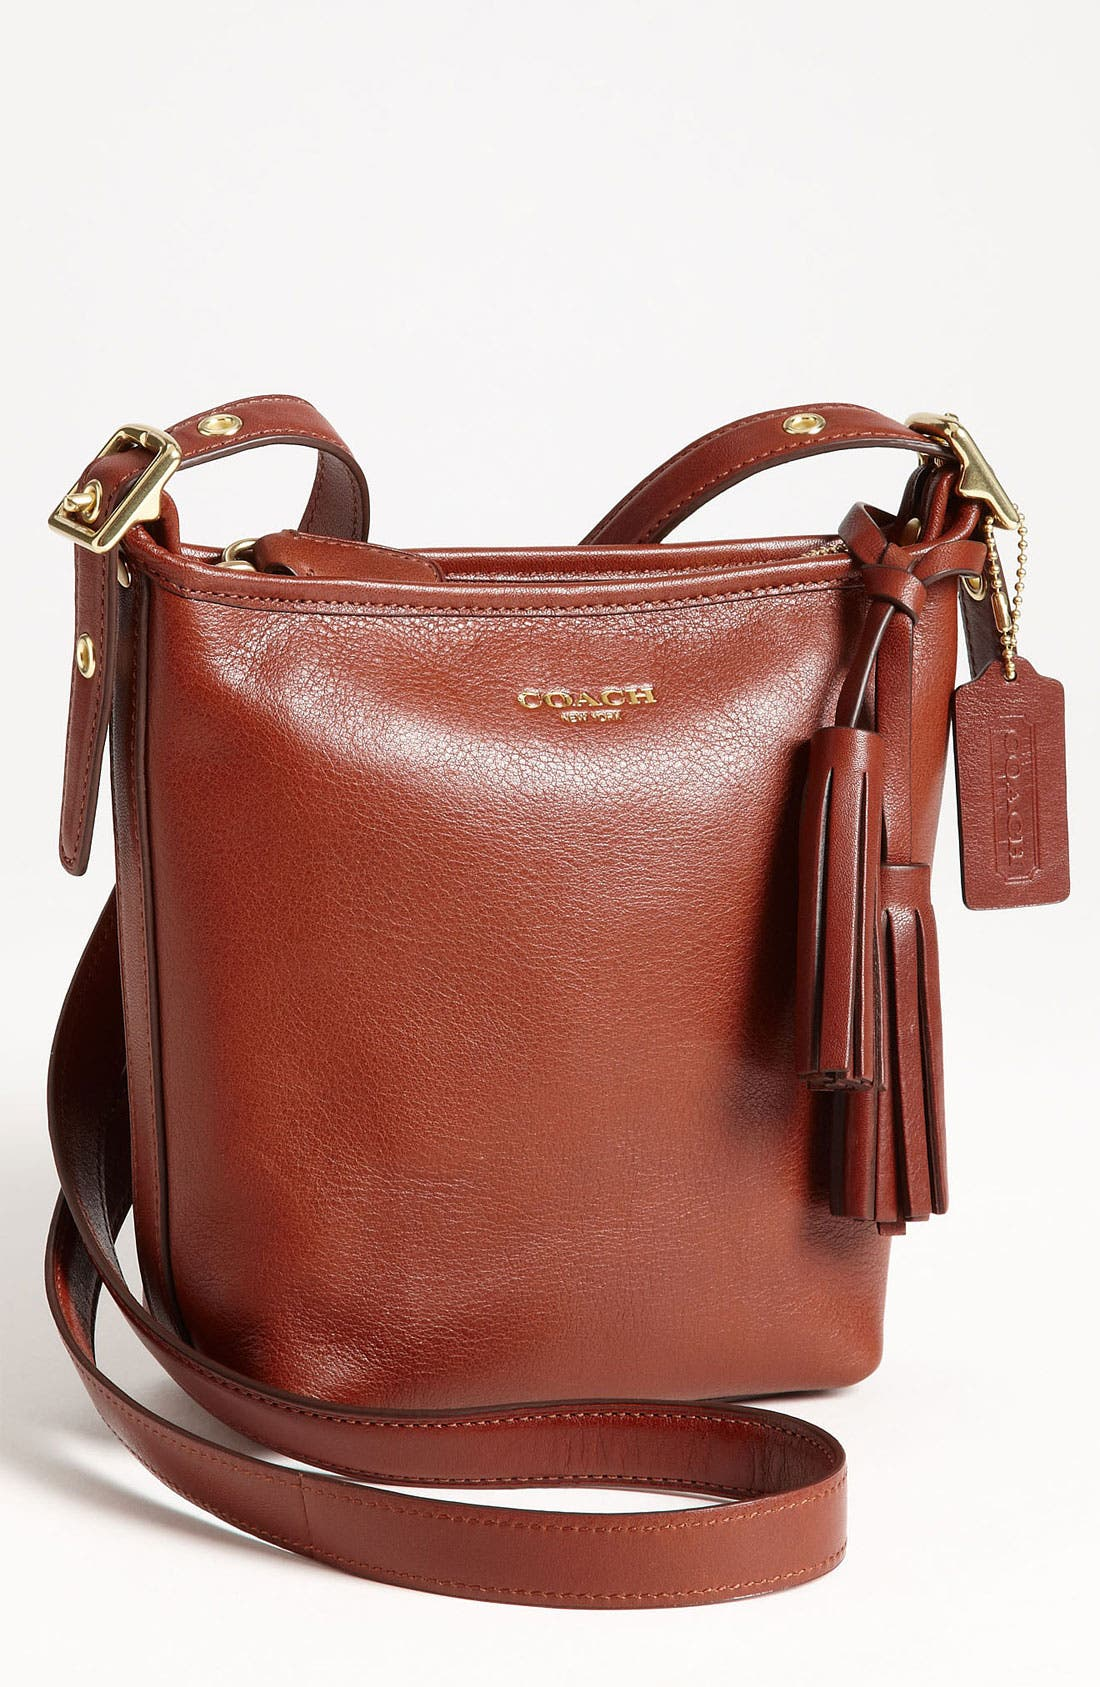 Main Image - COACH 'Legacy - Mini' Leather Shoulder Bag